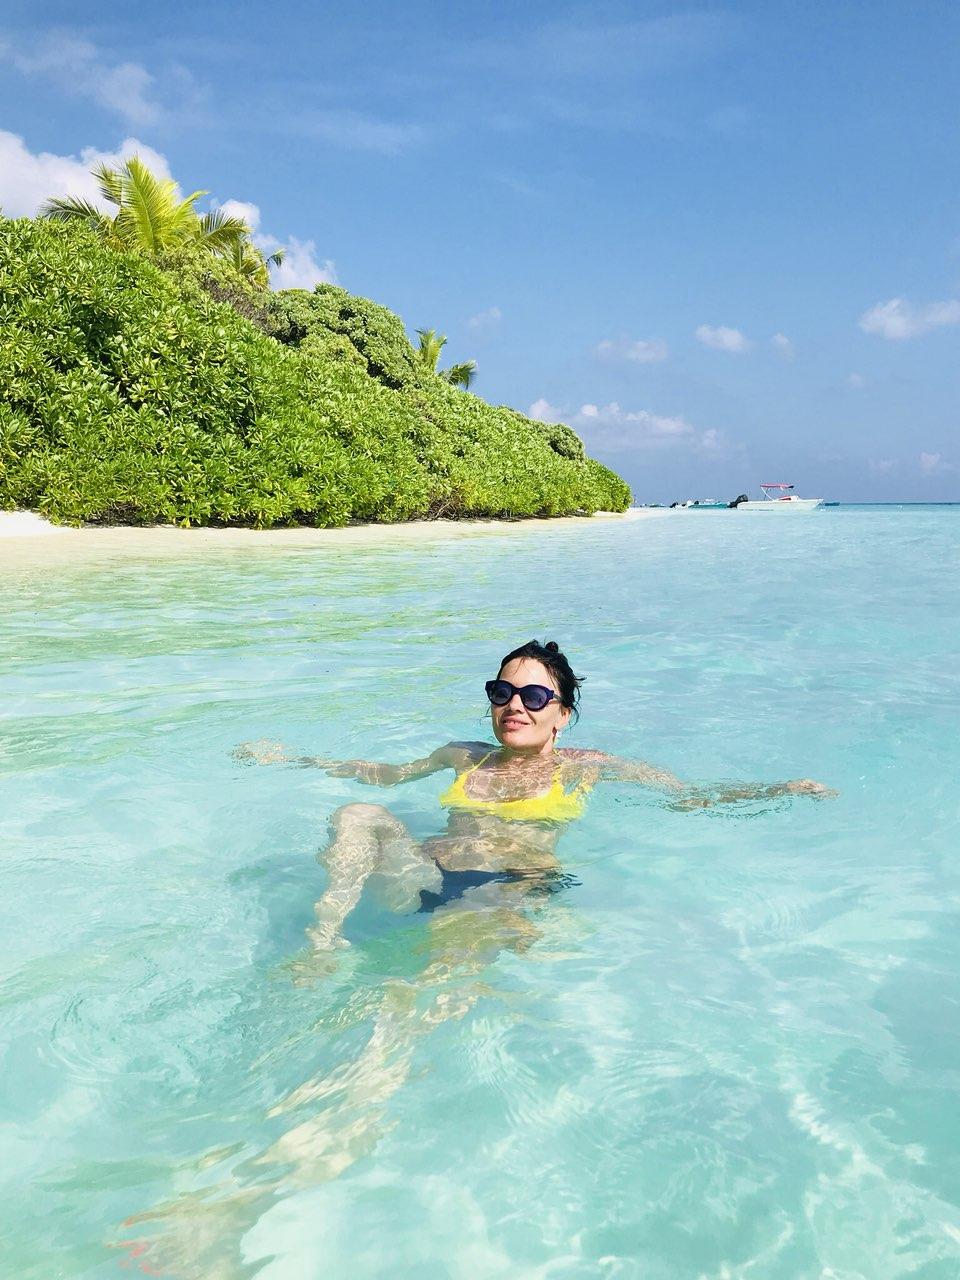 dive villa thodoo guest house maldives ОРЕл И РЕШКА ПО МОРЯМ ДАЙВ ВИЛЛА ТОДДУ МАЛЬДИВЫ beach retreat yoga group